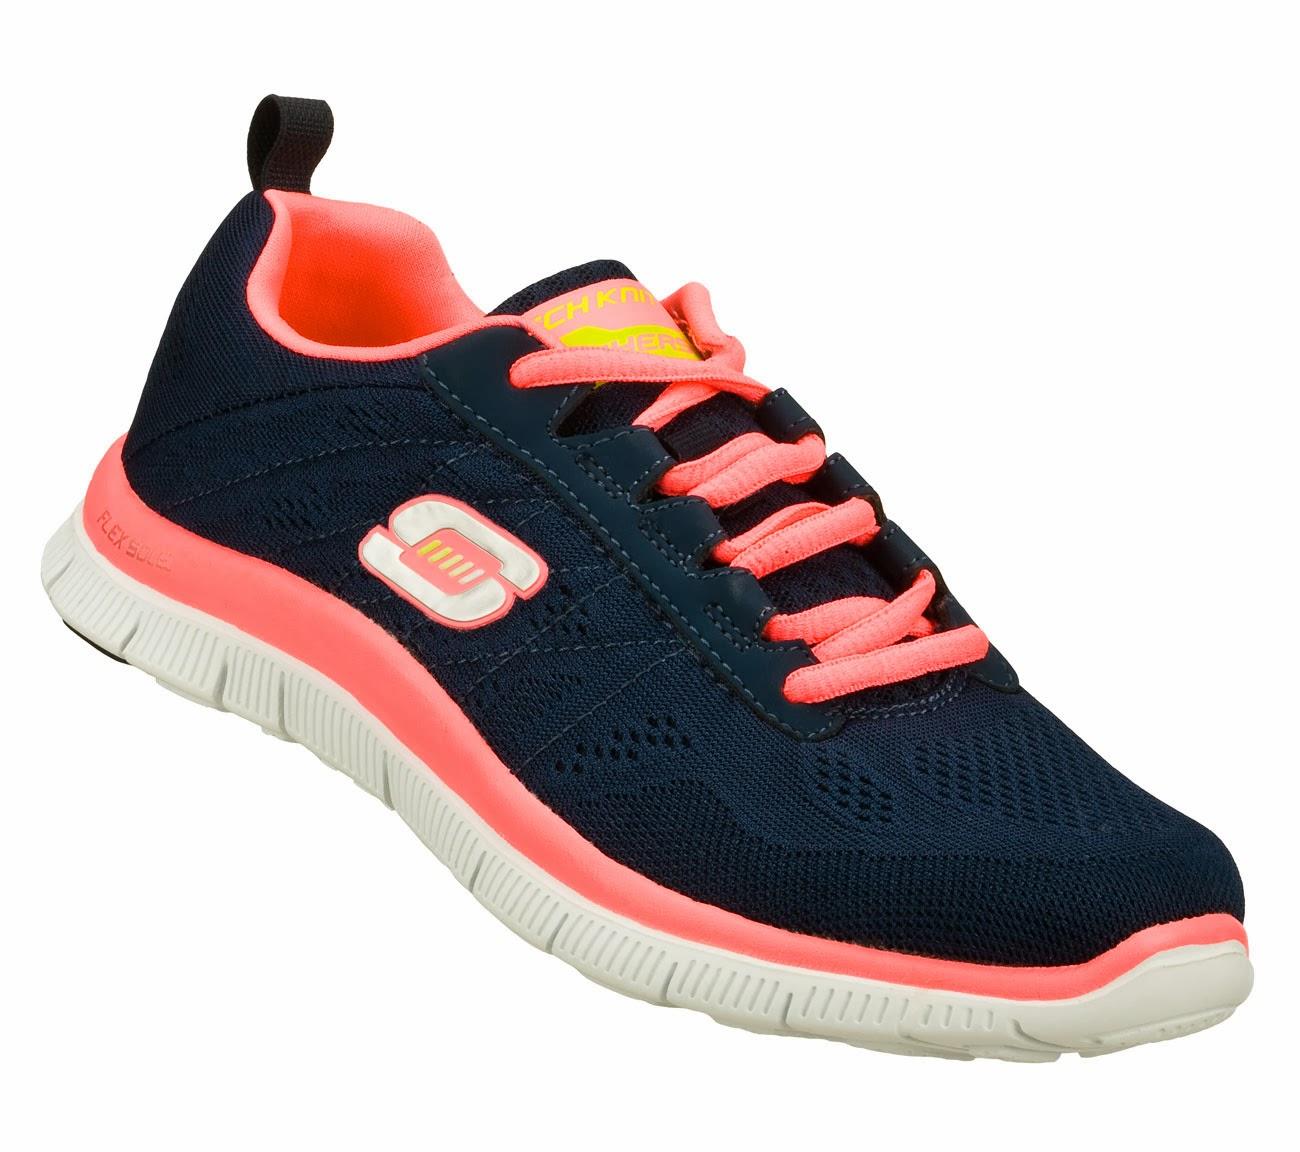 d17062e6c516d8 Post a pic of the type shoes you like to wear? - GirlsAskGuys